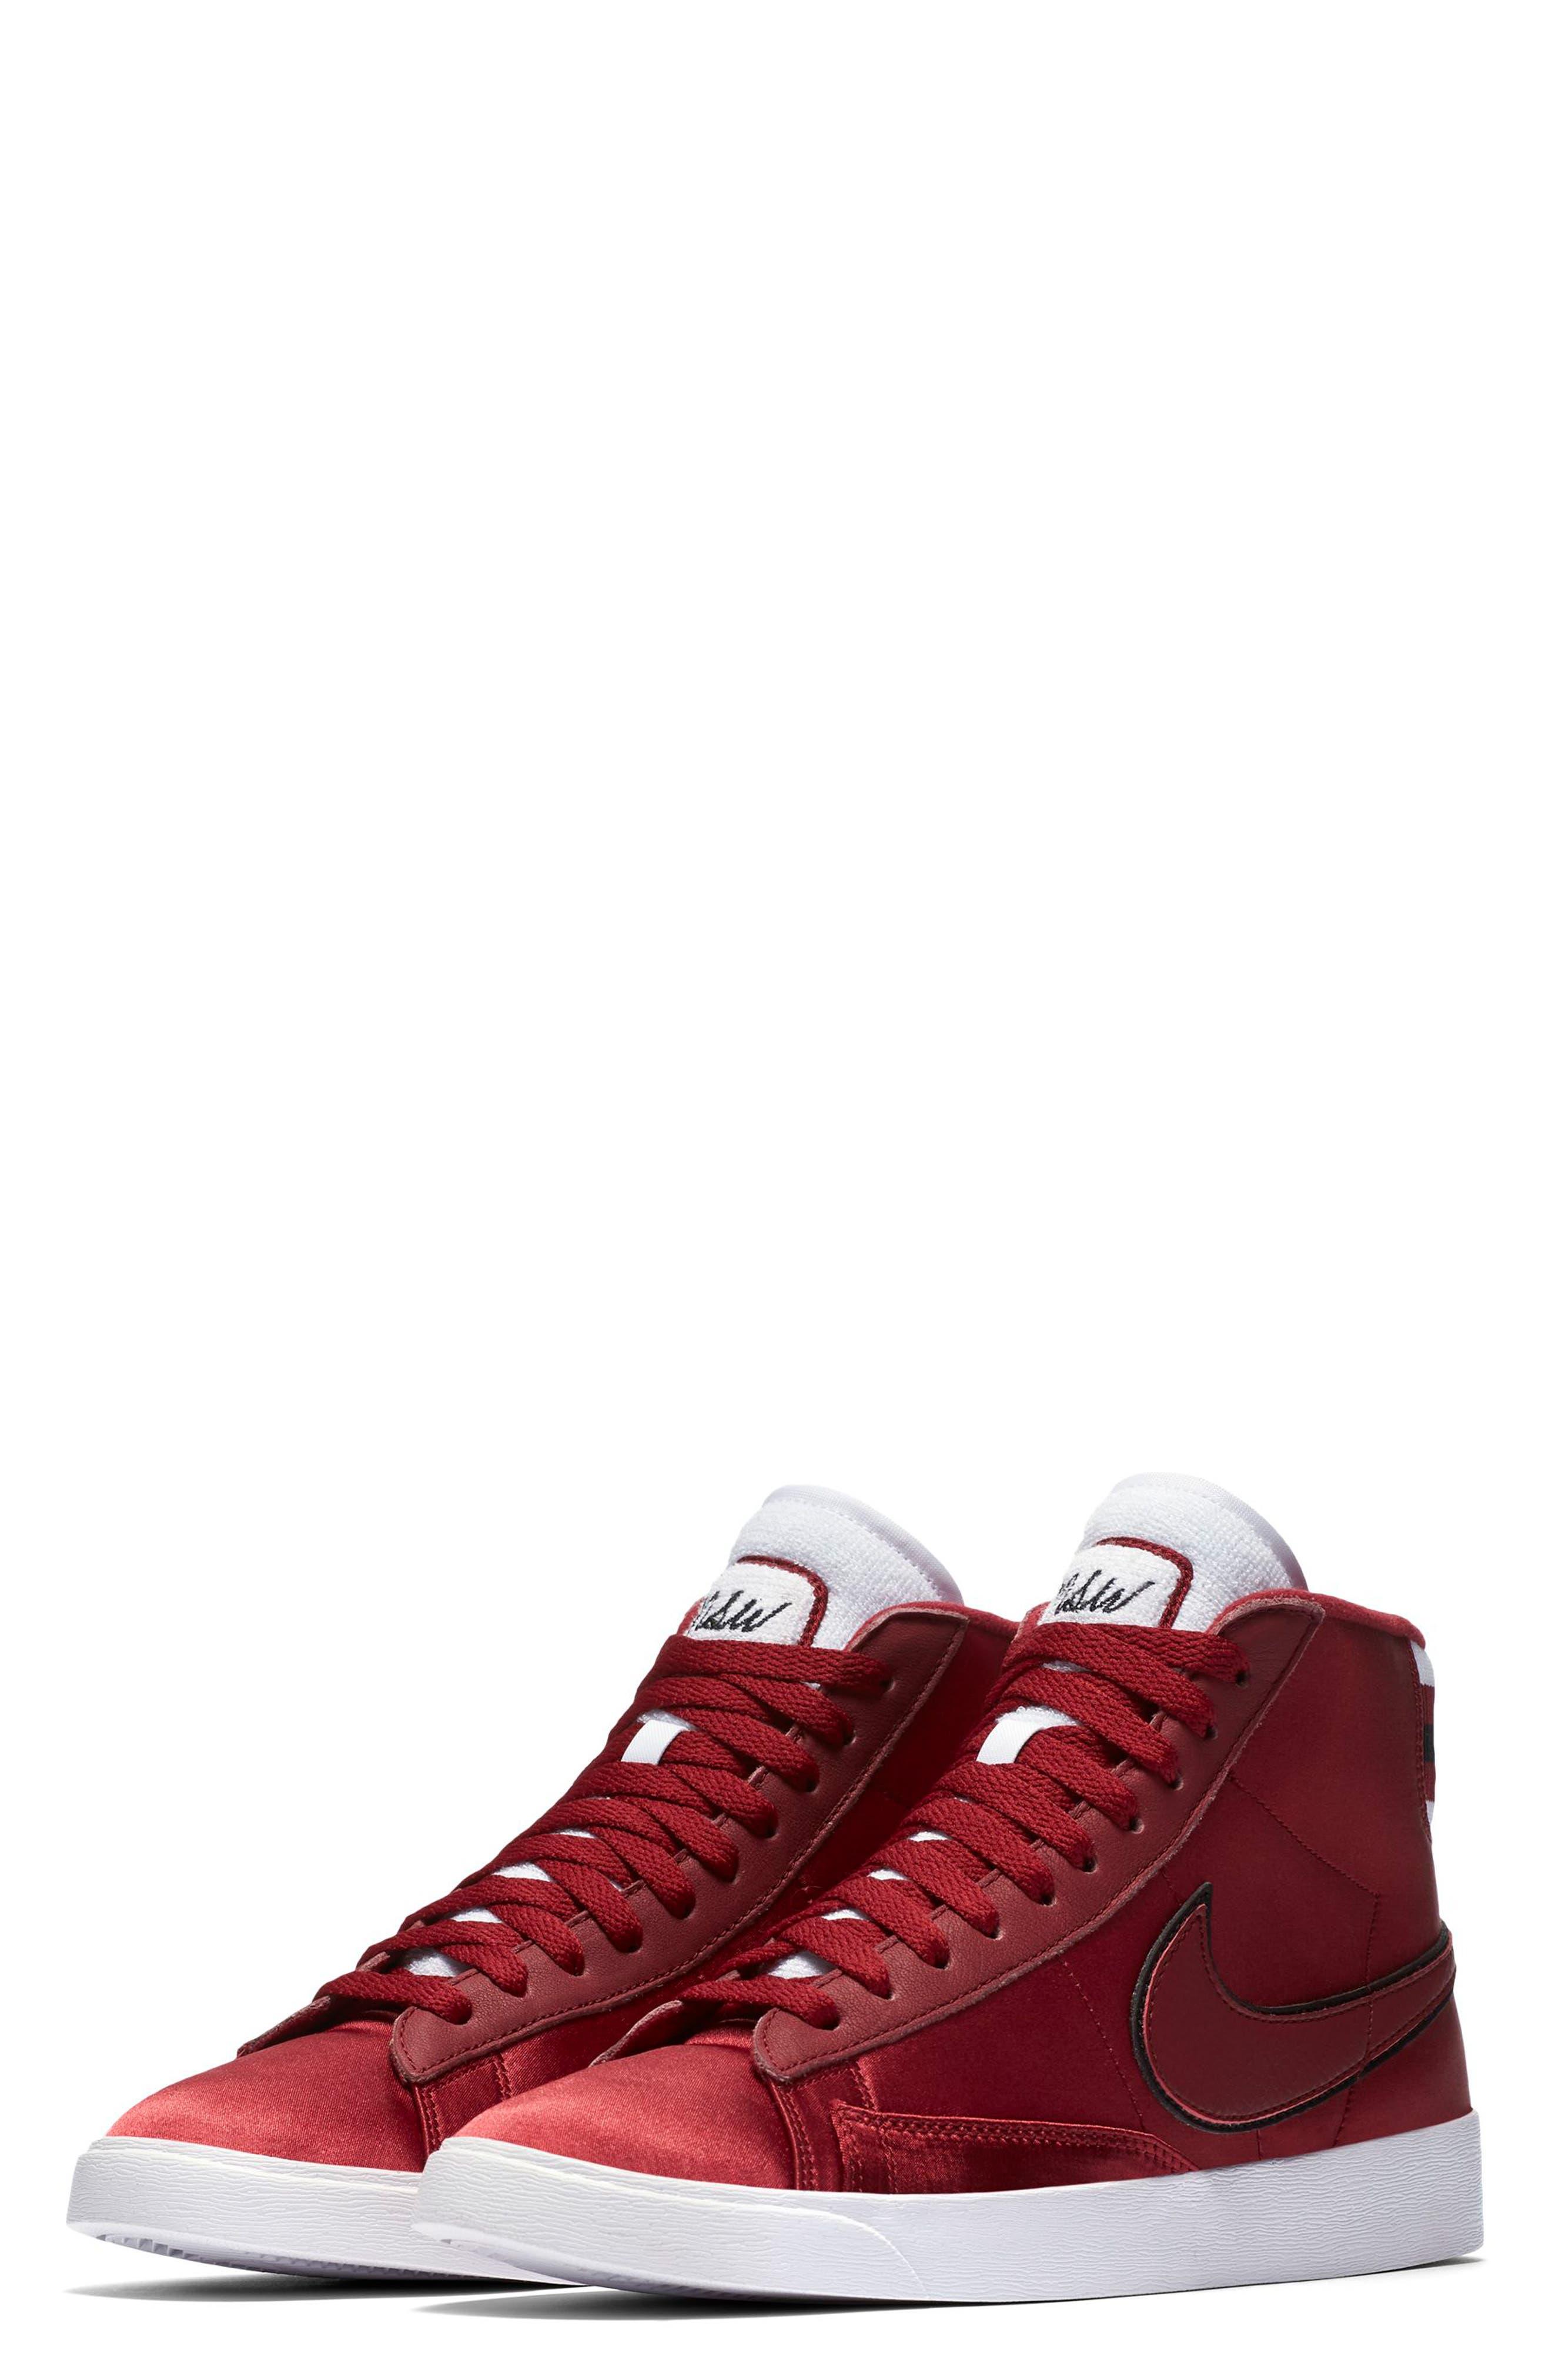 separation shoes 82a69 3d39f ... low gt mens skateboarding shoes ivory gum light brown black 704939  bf130 432e1  italy nike blazer mid top sneaker women 8c0ec a1737